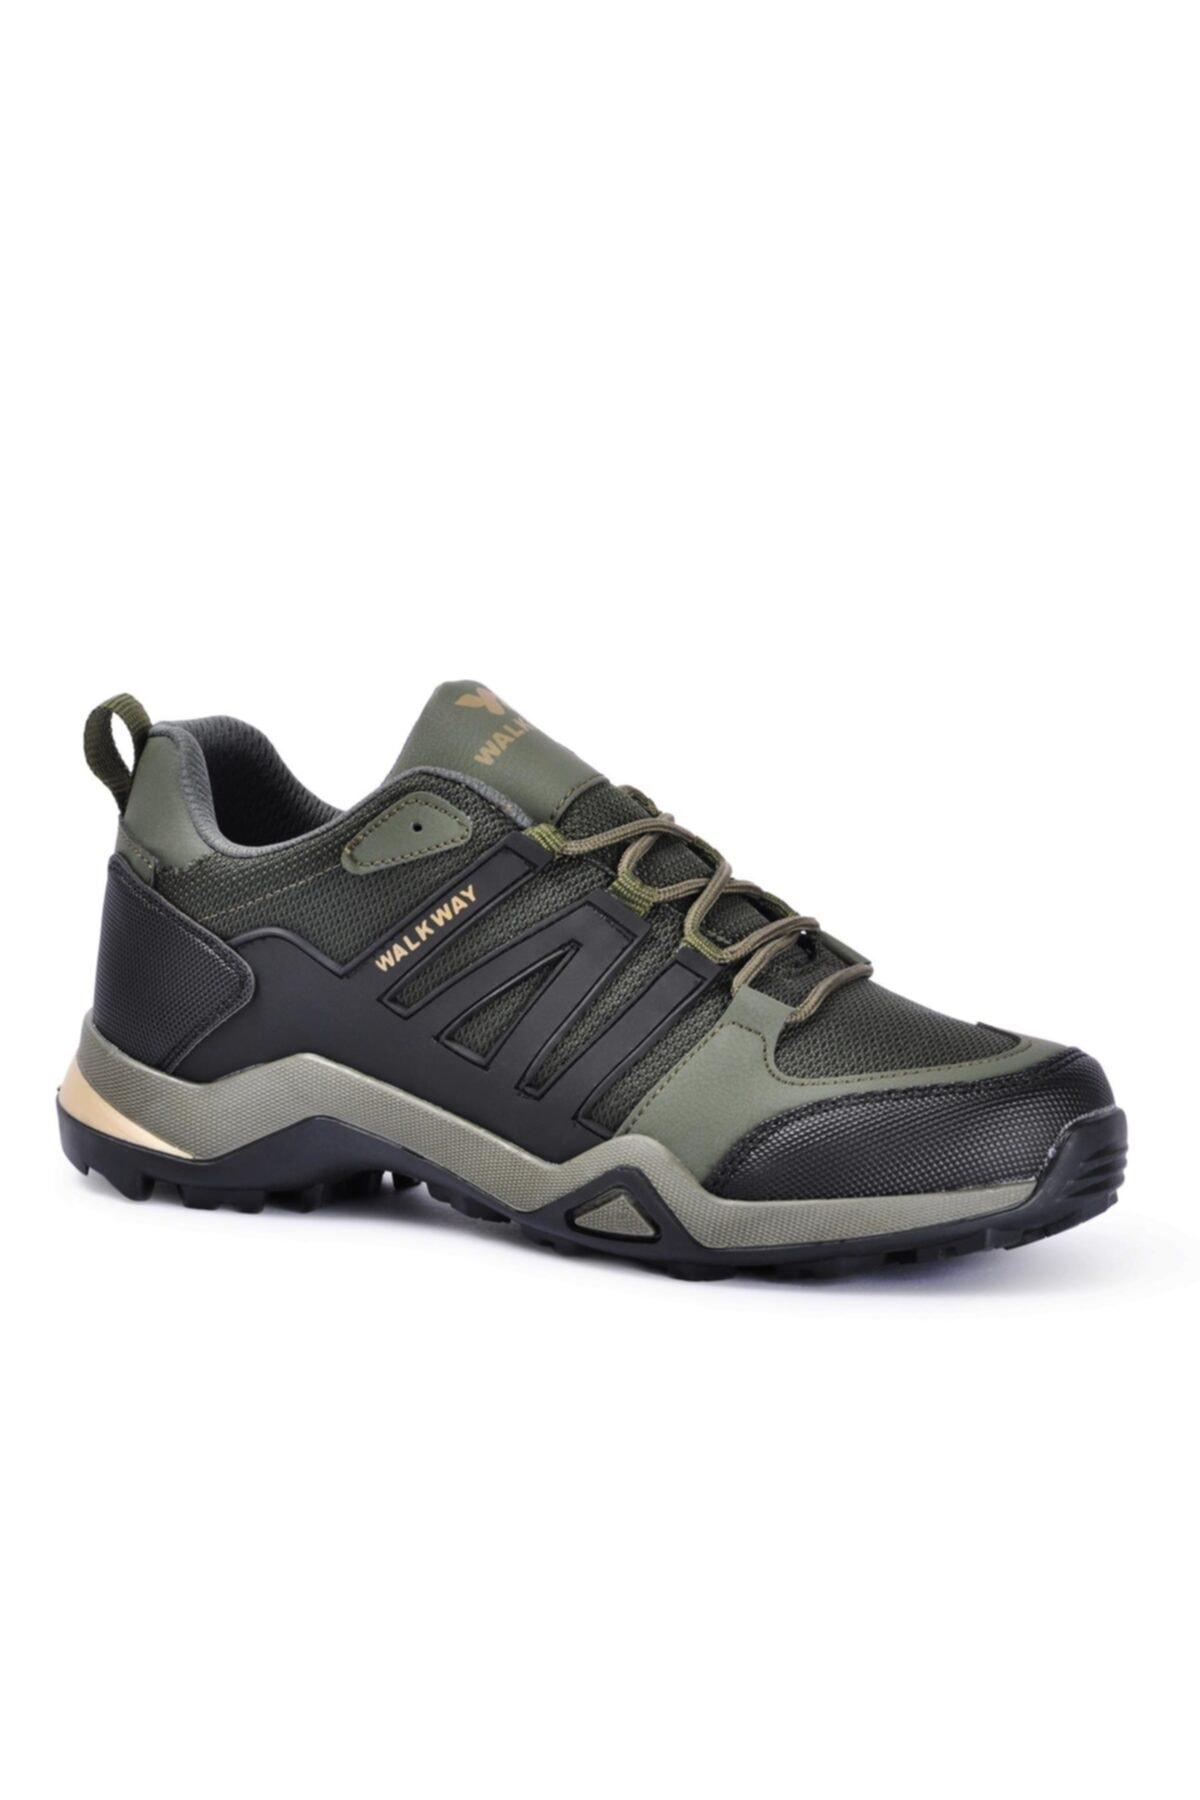 کفش کوهنوردی مردانه مارک برند WALKWAY رنگ خاکی کد ty71570508